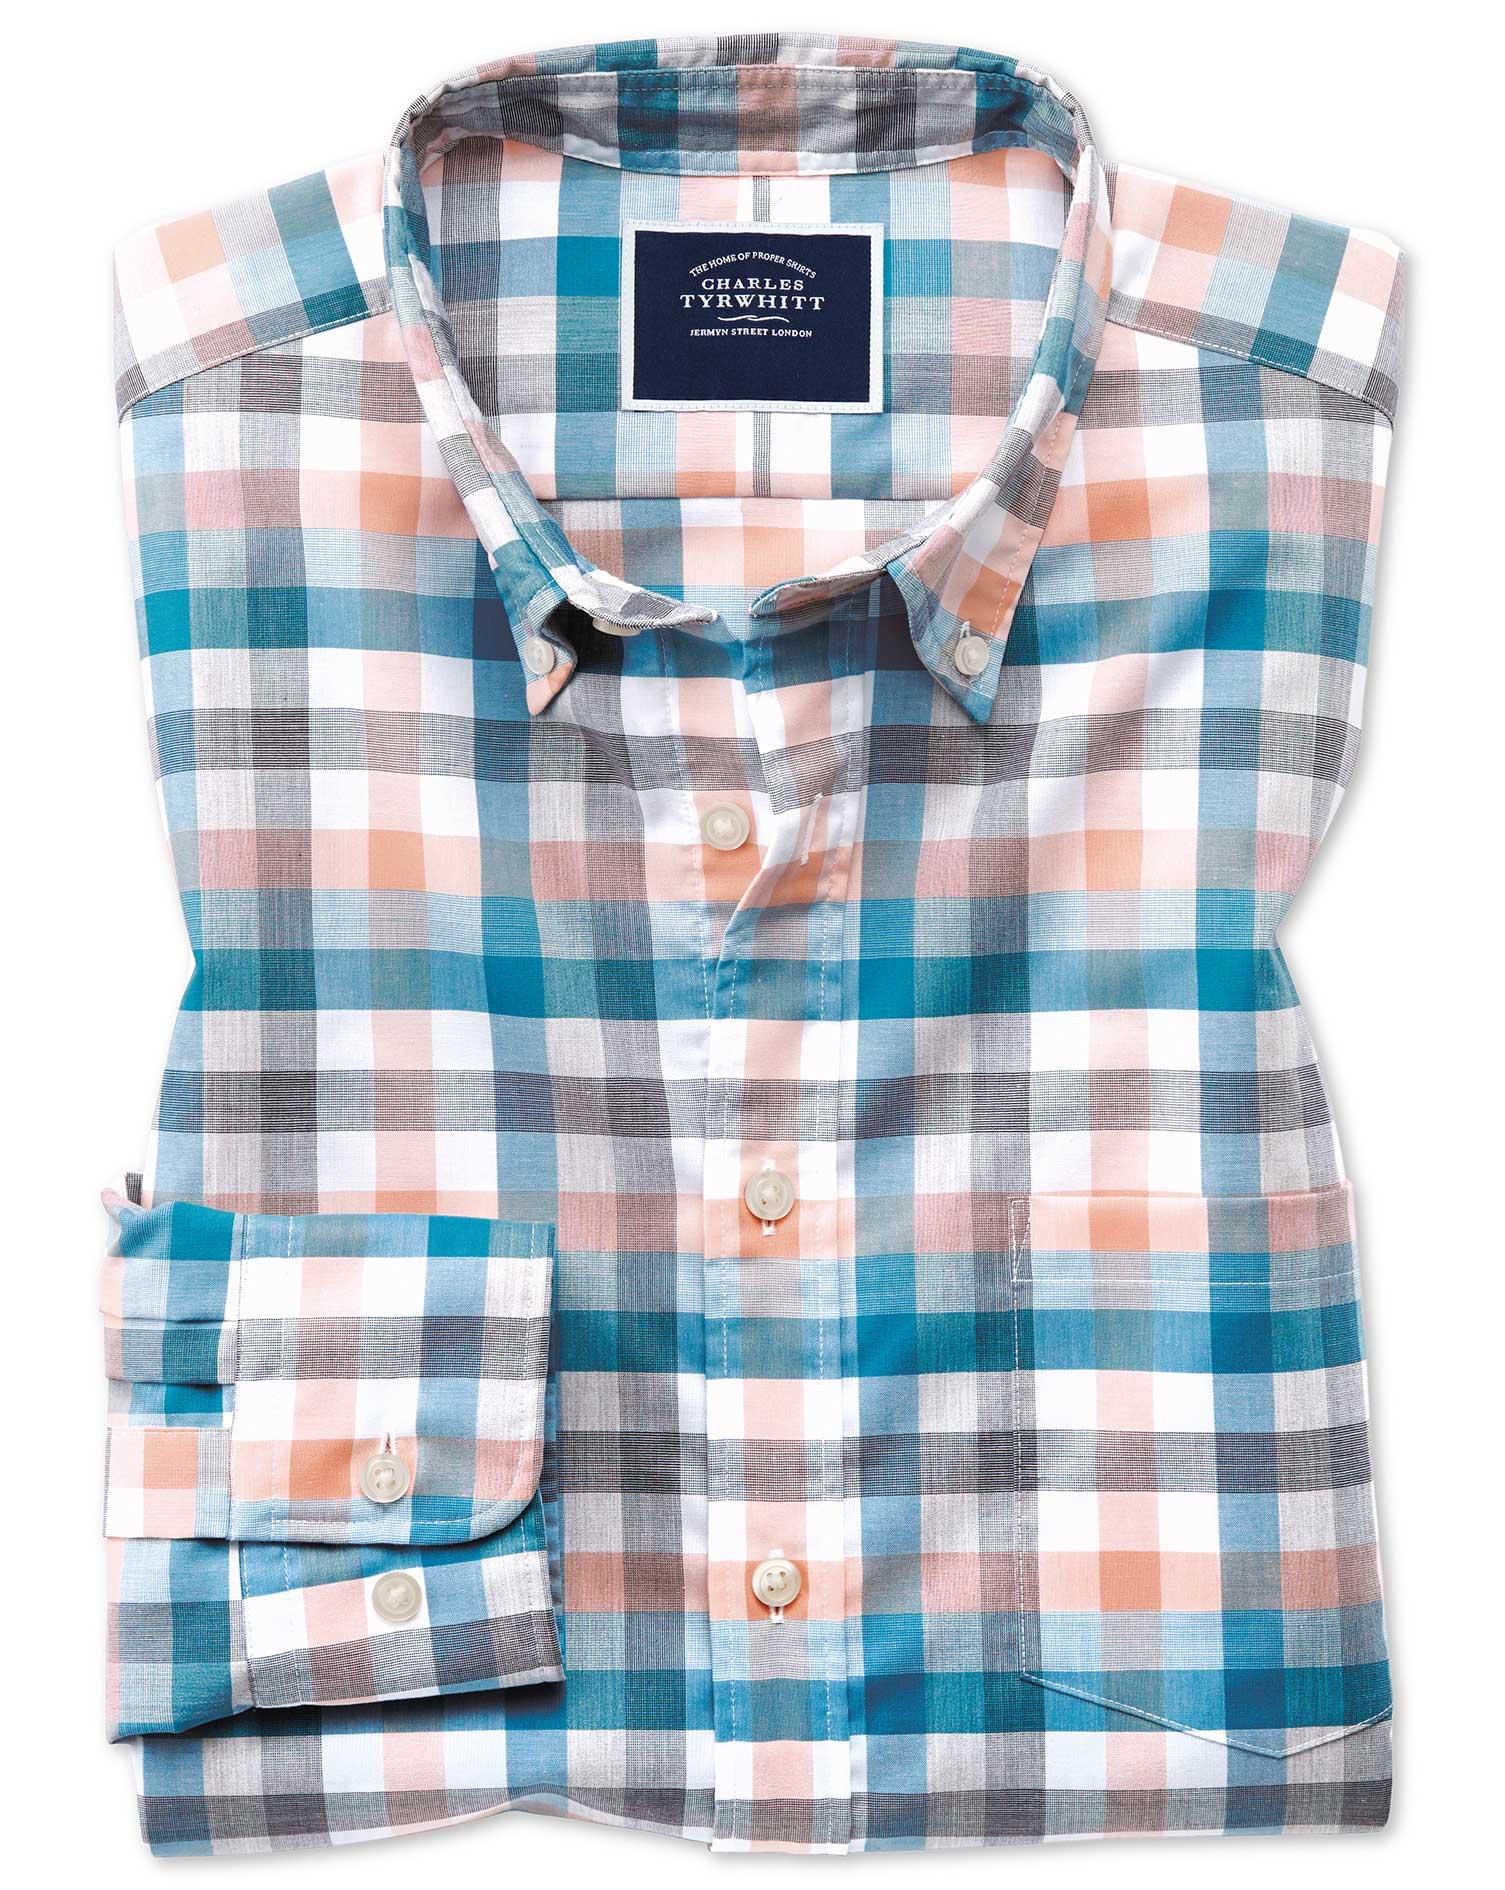 Classic Fit Coral Multi Check Soft Washed Non-Iron Tyrwhitt Cool Cotton Shirt Single Cuff Size XXL b